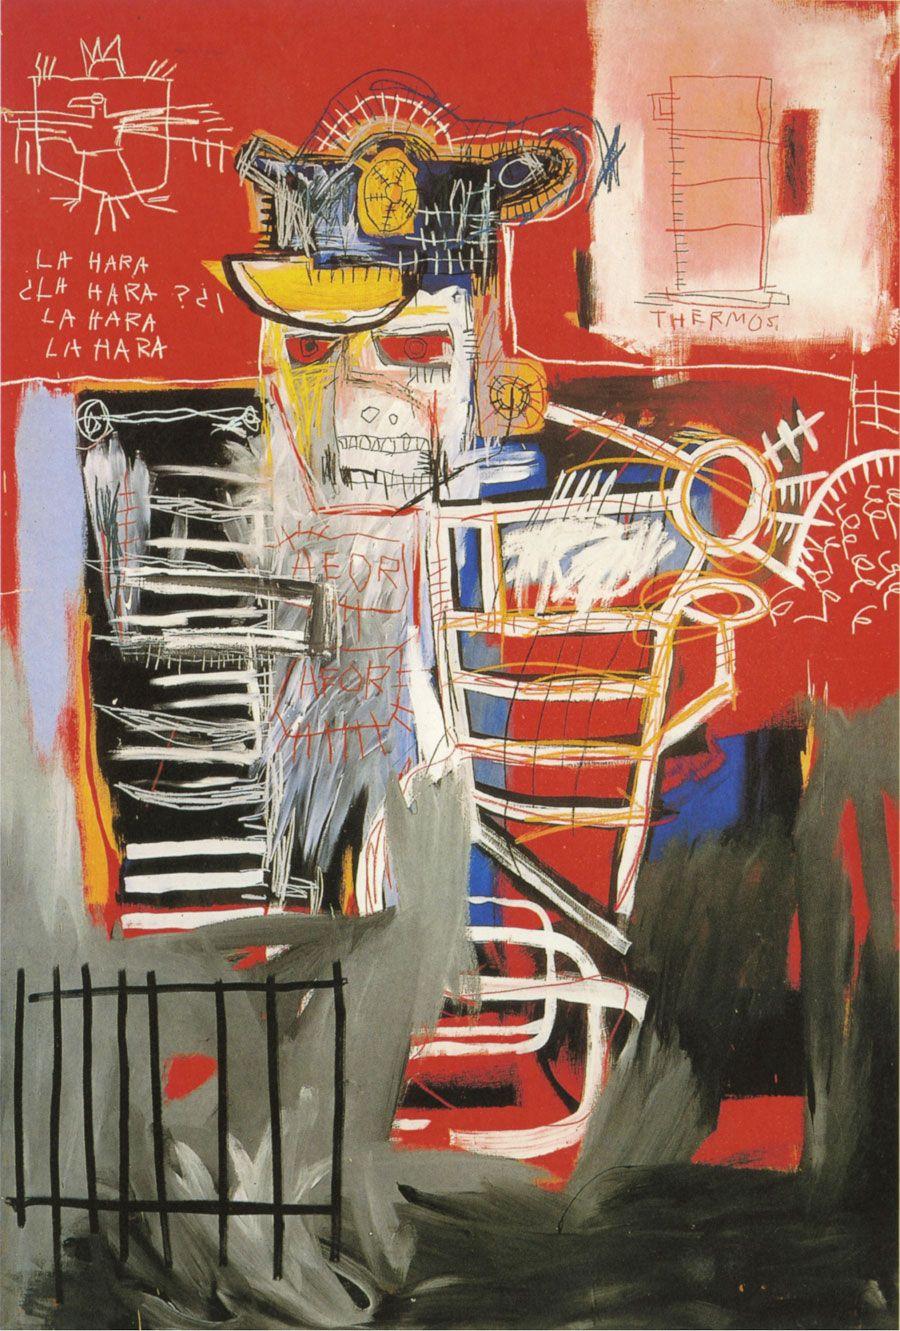 Jean-Michel Basquiat - February 7 - April 6, 2013 - Images - Gagosian Gallery